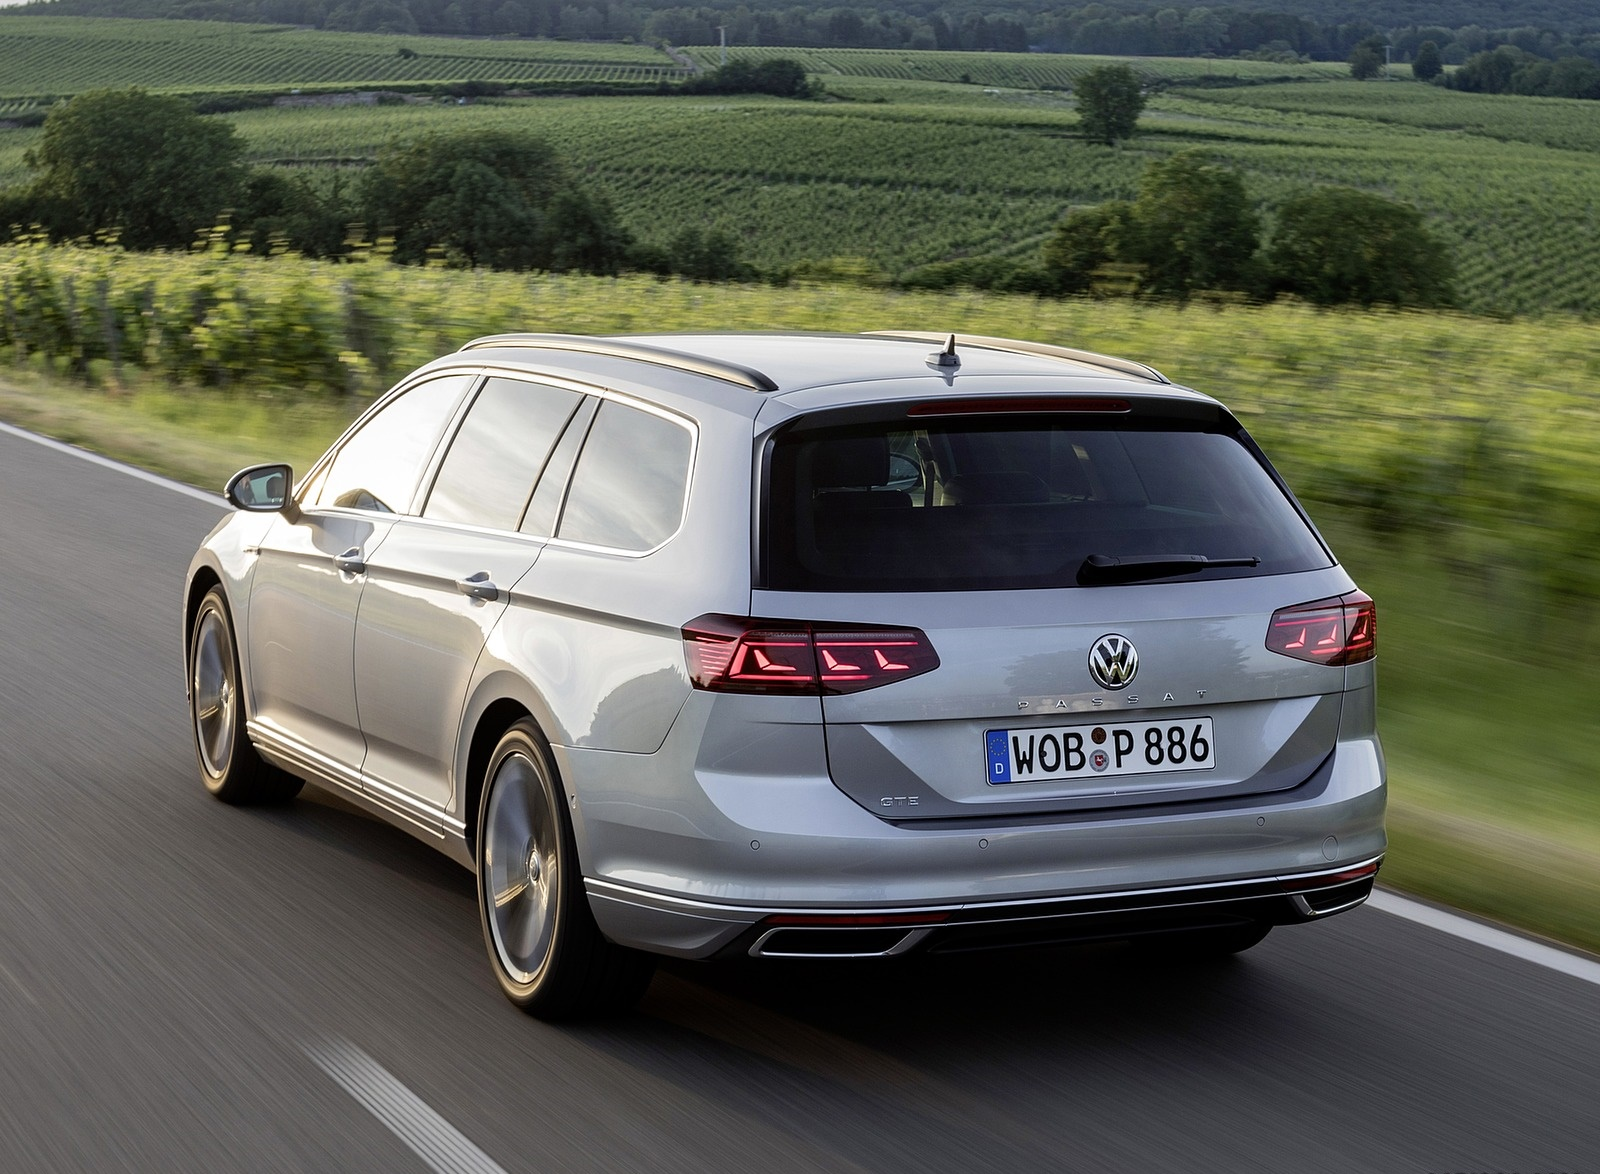 2020 Volkswagen Passat GTE Variant (Plug-In Hybrid EU-Spec) Rear Three-Quarter Wallpapers (6)